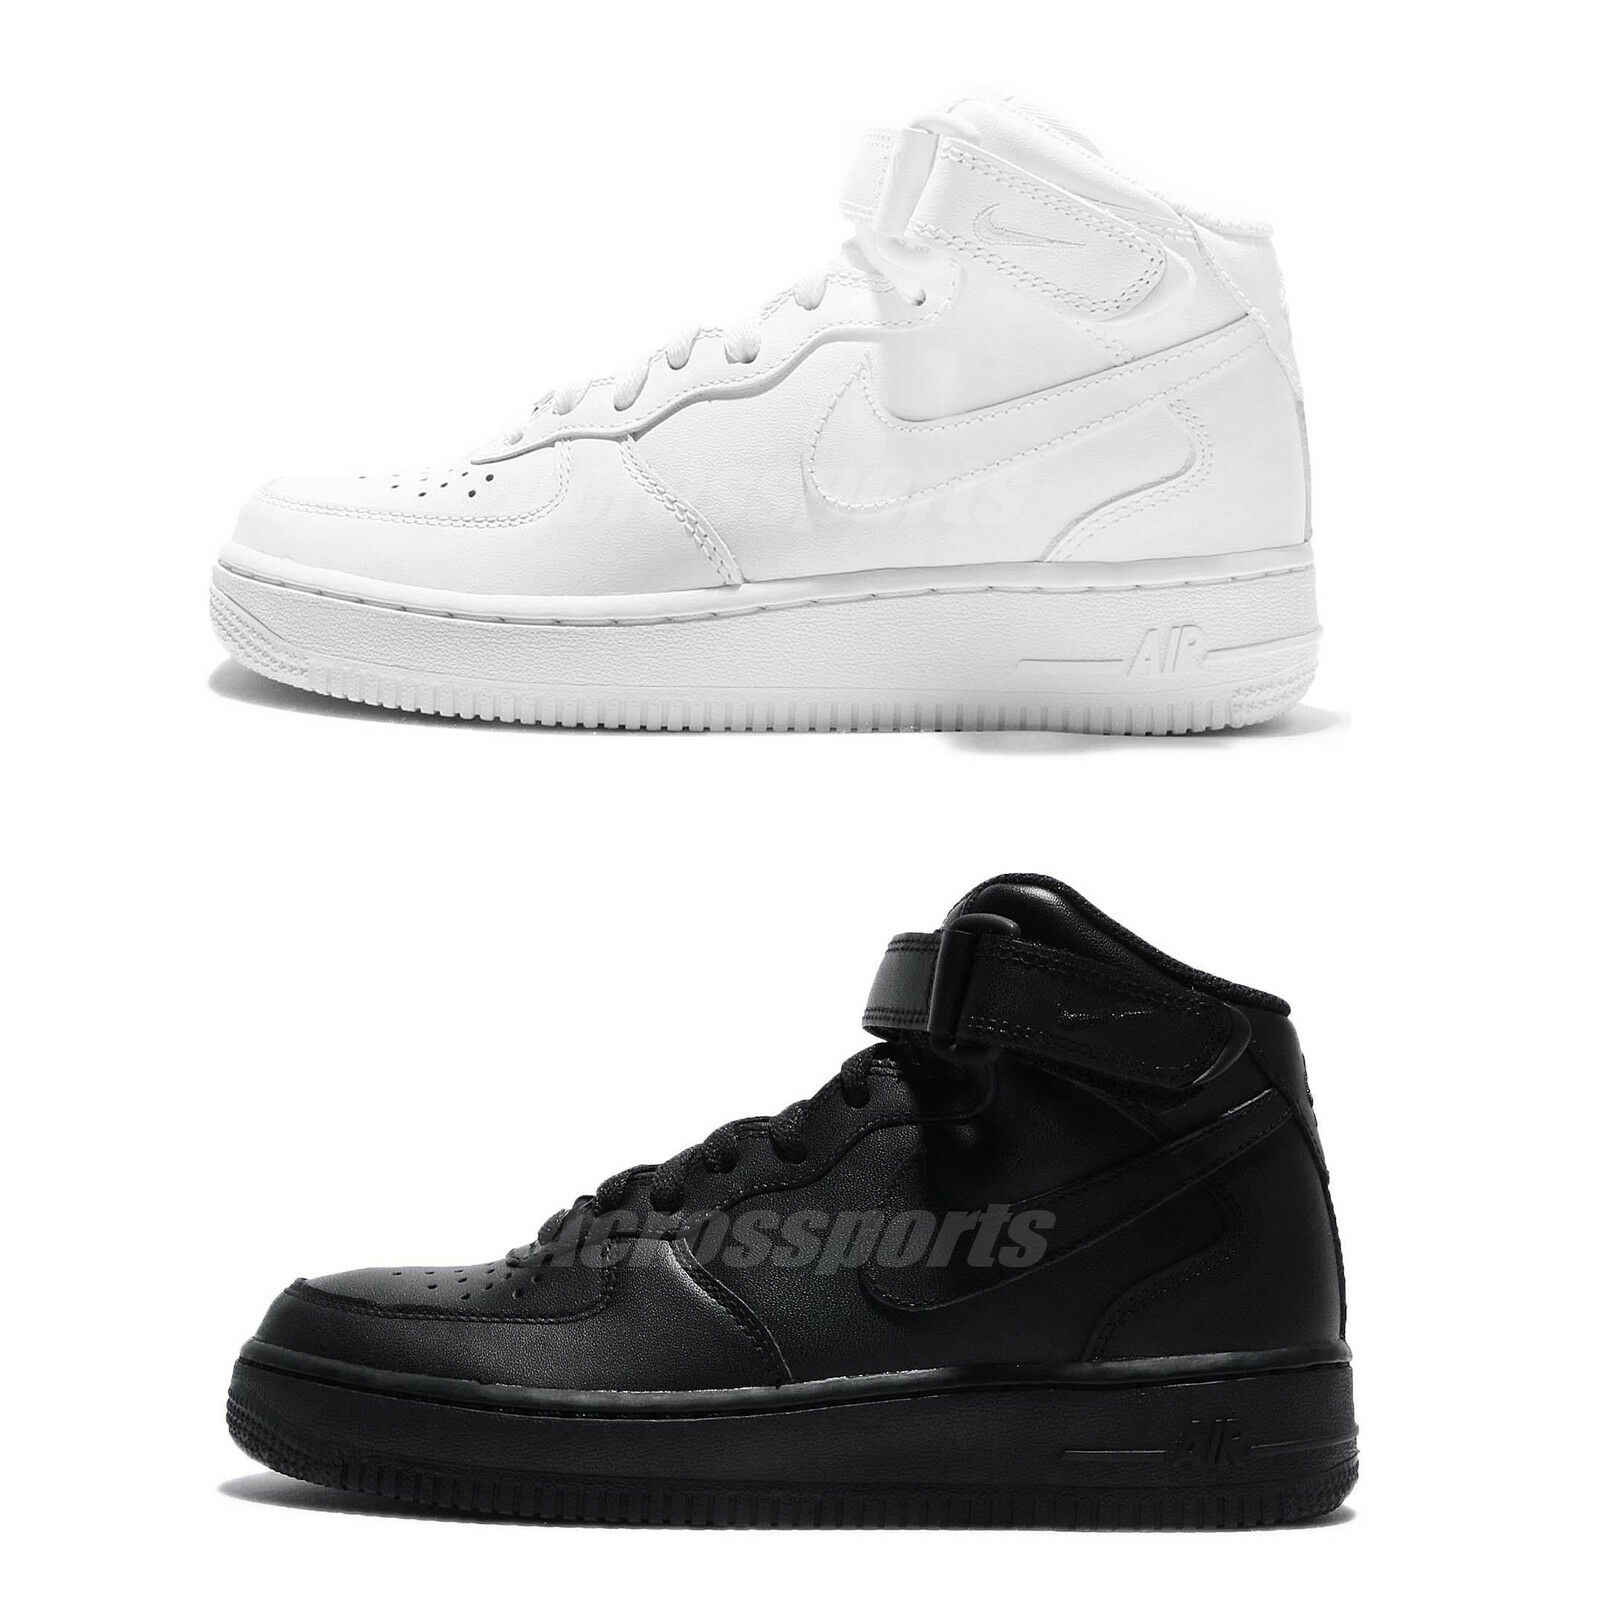 Nike Air Force  1 Mid 07 LE One nero   bianca Men Classic Scarpe scarpe da ginnastica Pick 1  comodamente